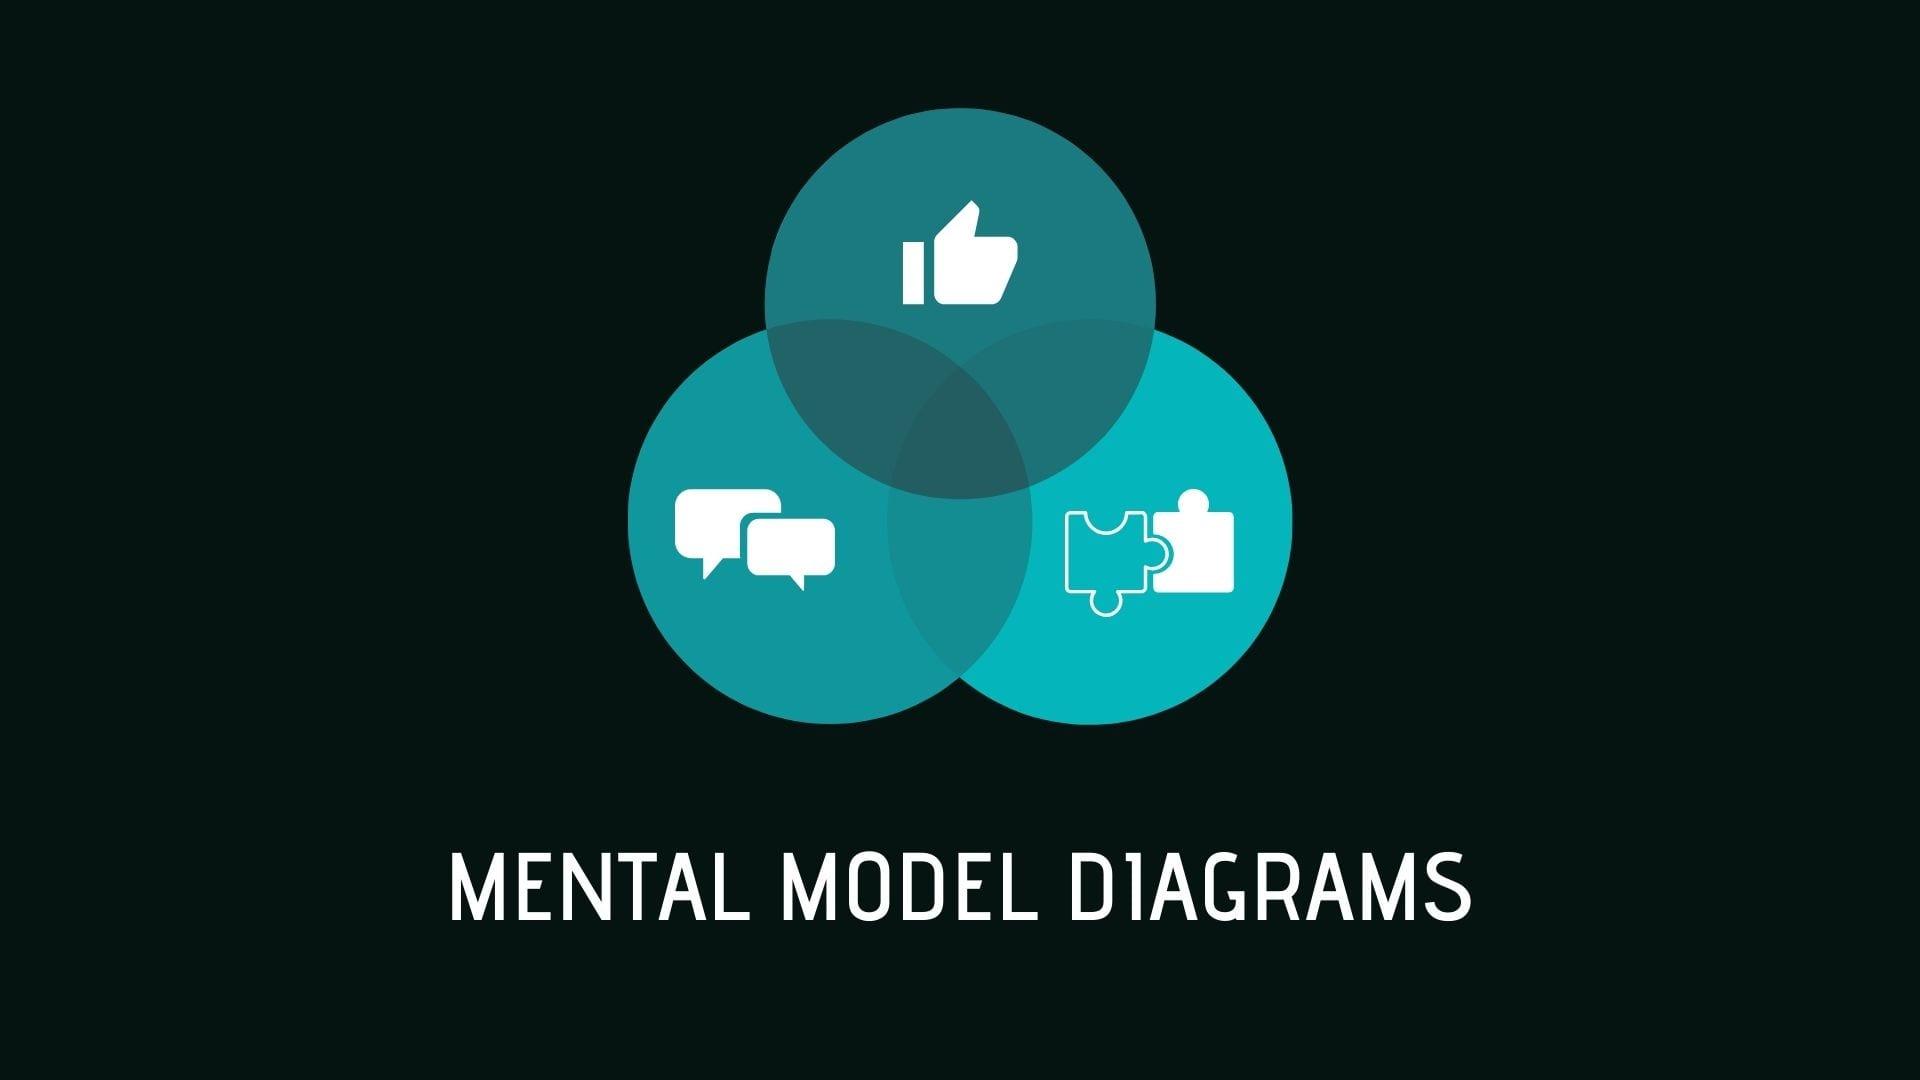 Mental Model Diagrams Cover Photo